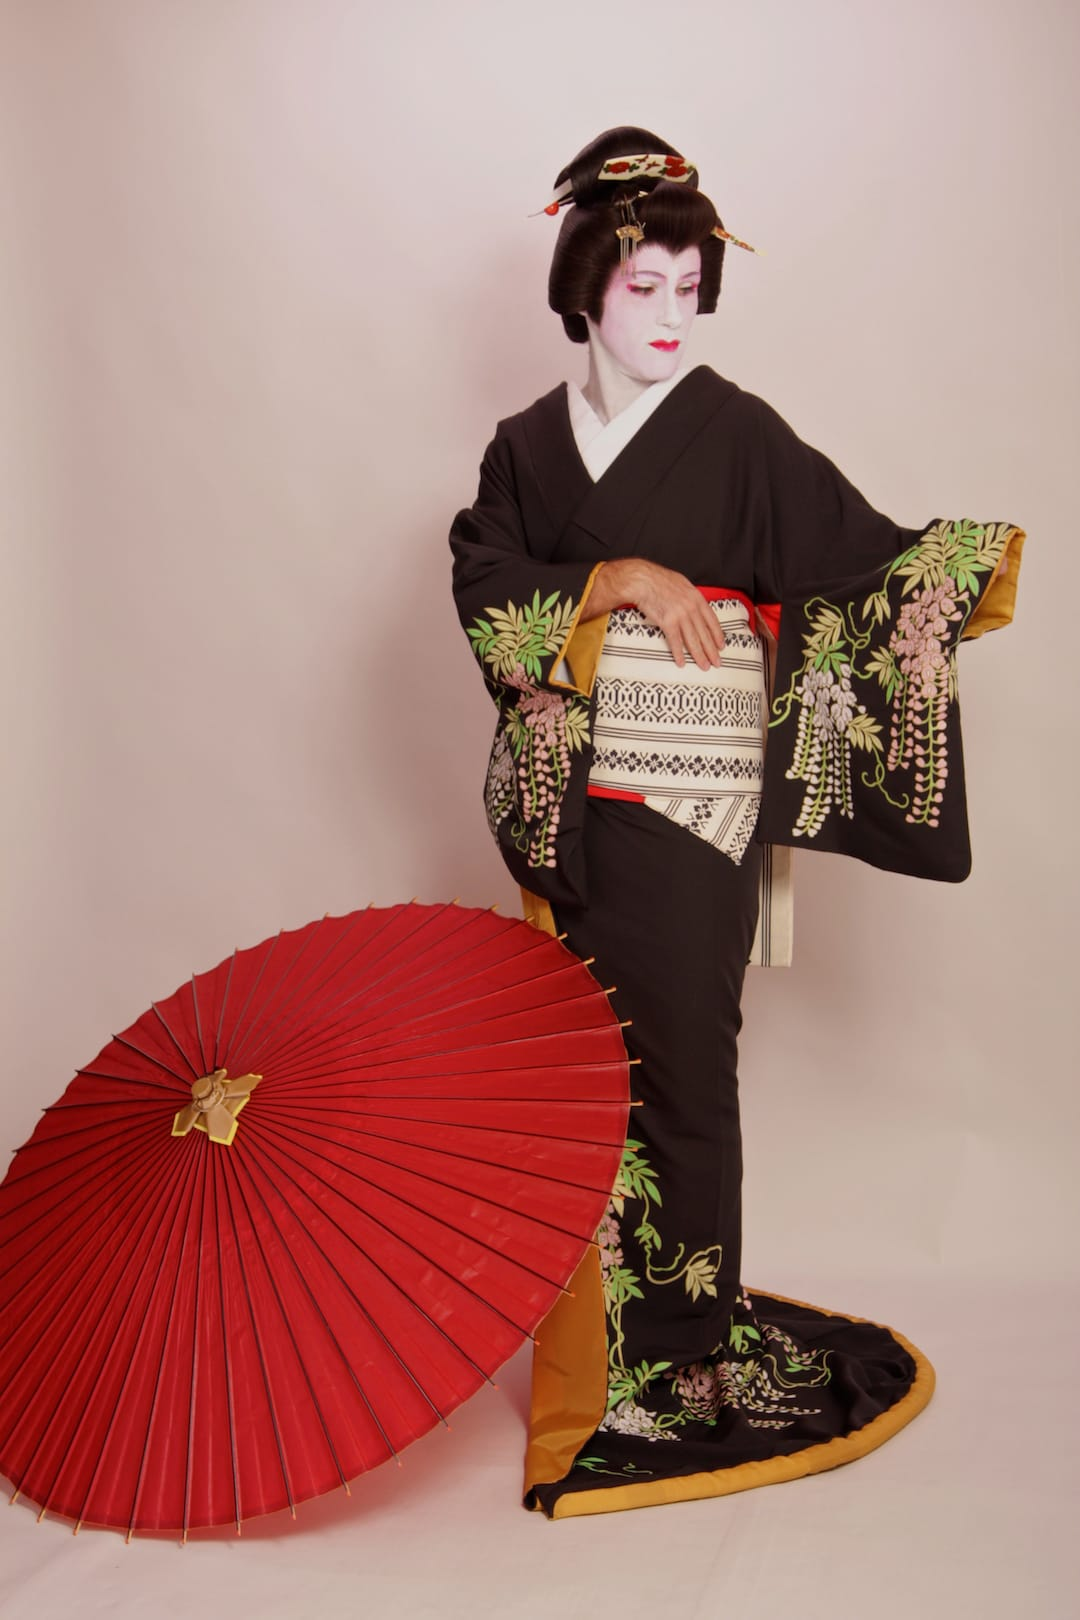 Sebastien geisha makeover transformation in Tokyo